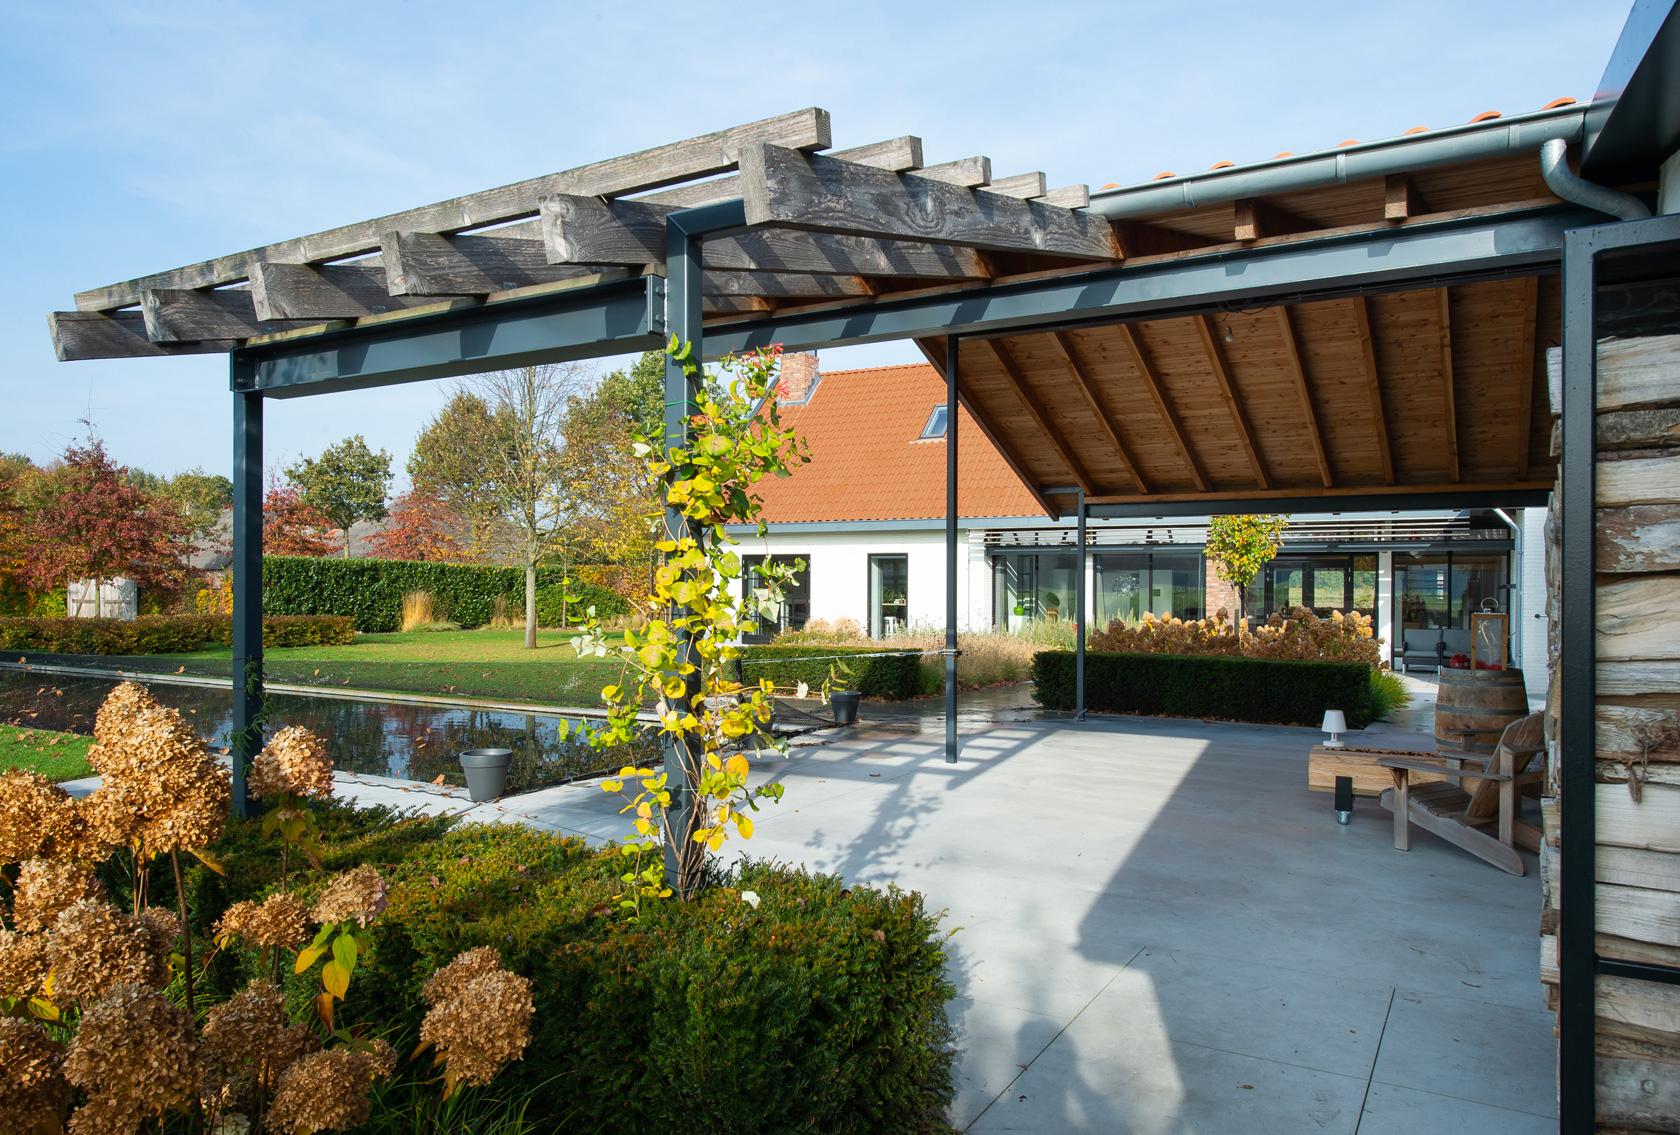 verbouwen-overkapping-met-buitenruimte-loungeplek-architect-5